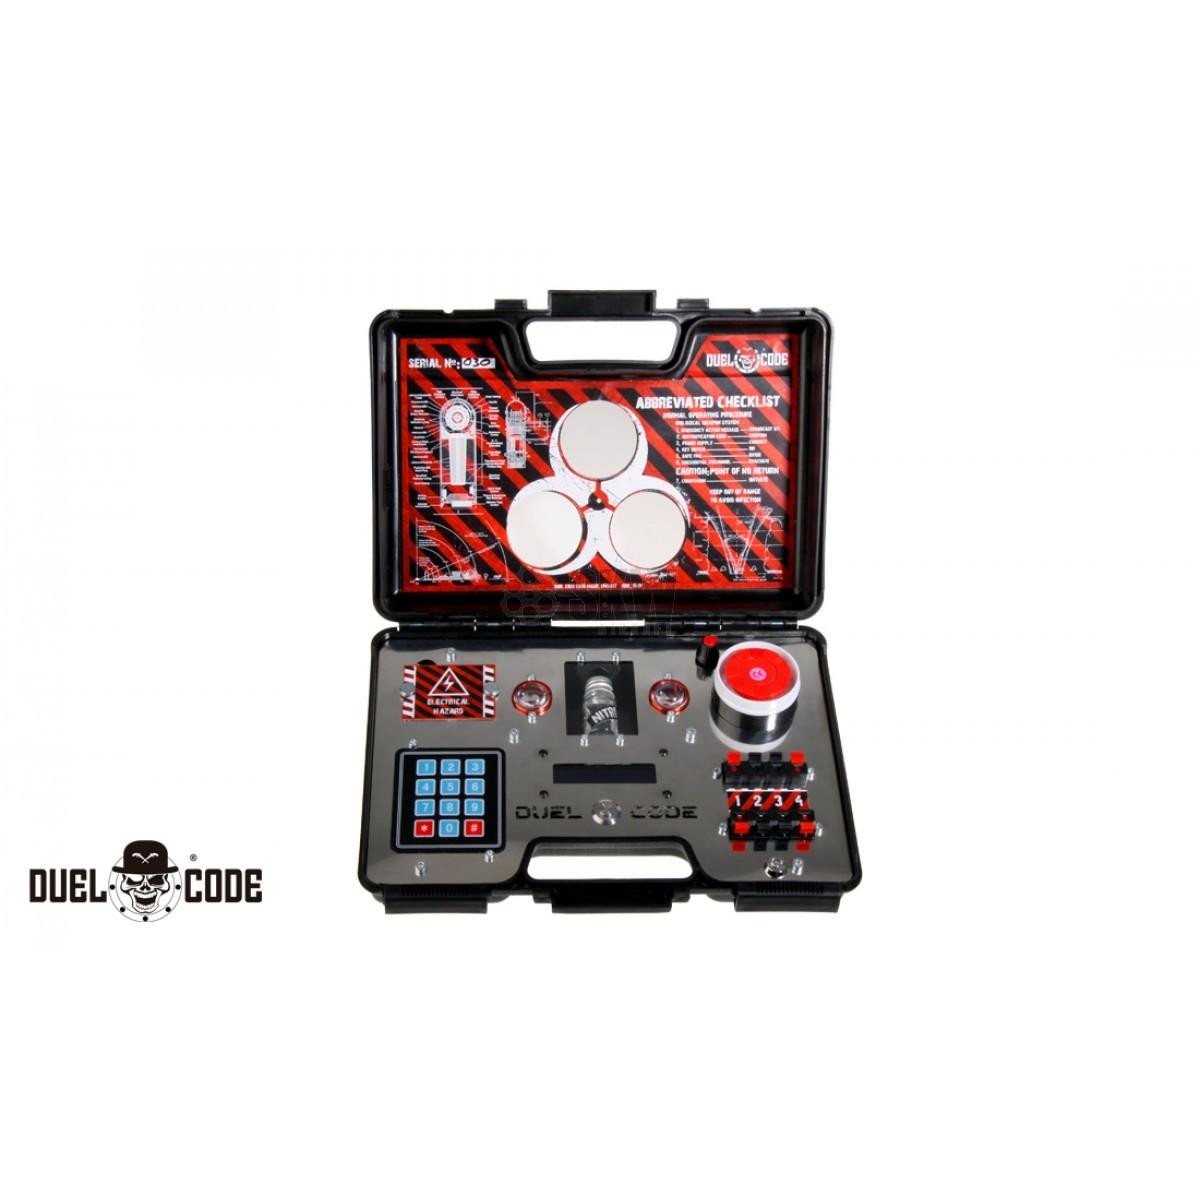 Duel Code Briefcase Bomb